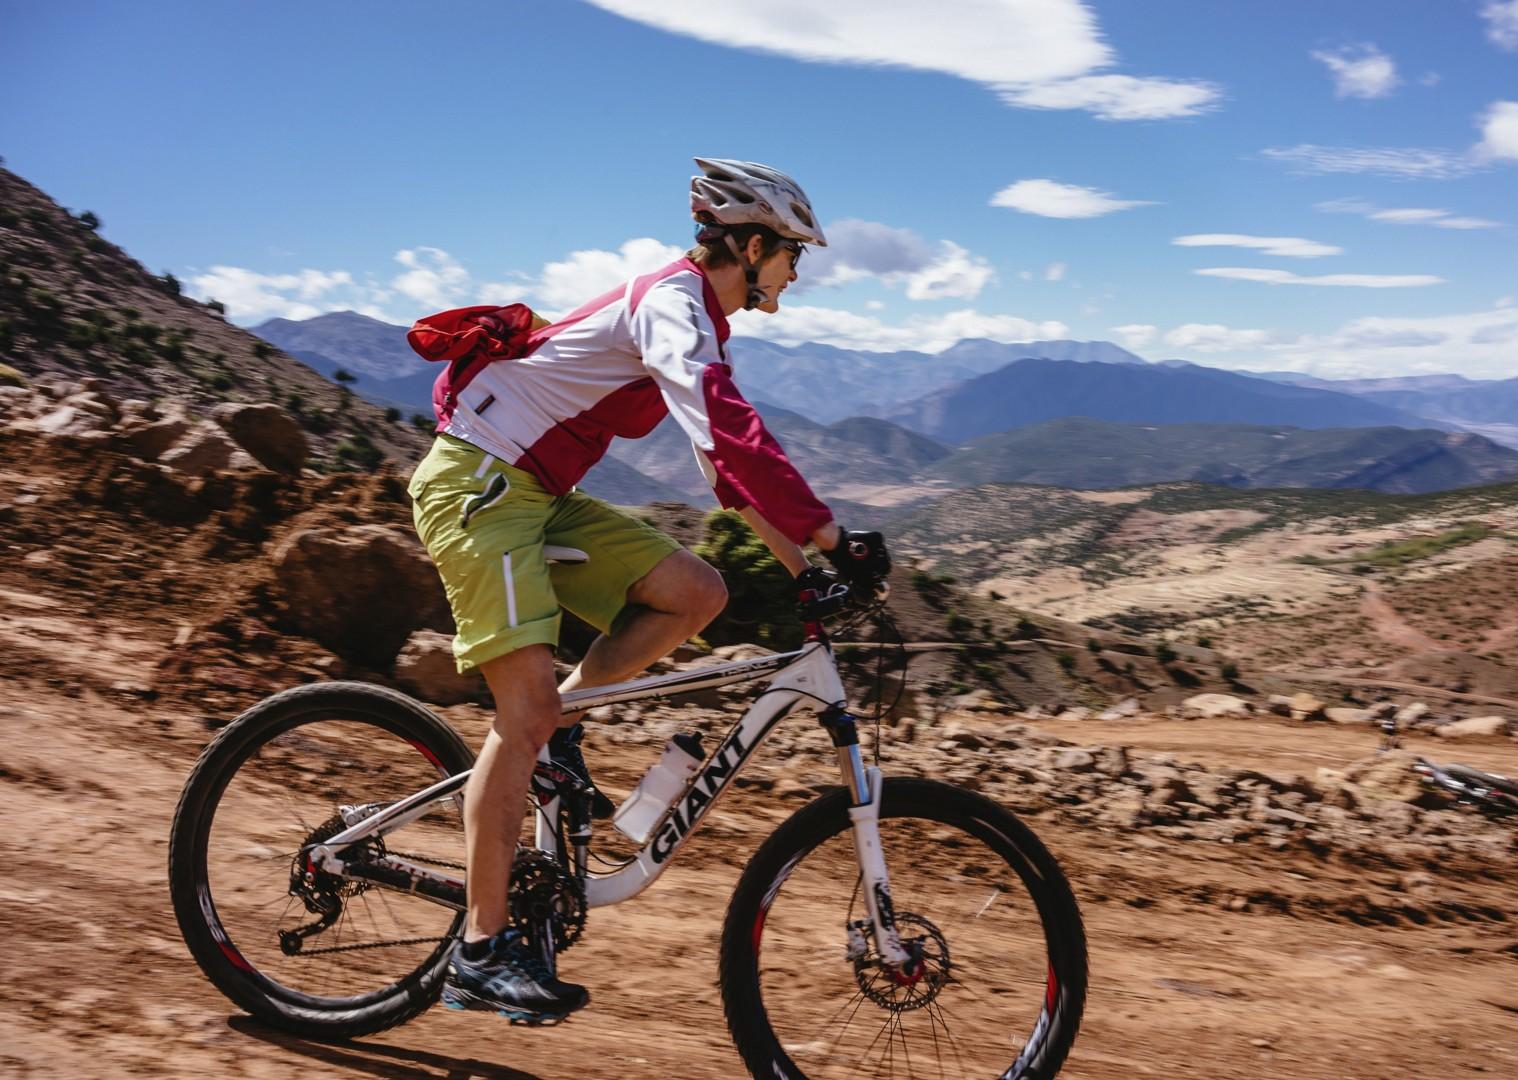 mountainbiking-mountain-morocco.jpg - Morocco - Atlas to Desert - Guided Mountain Bike Holiday - Mountain Biking